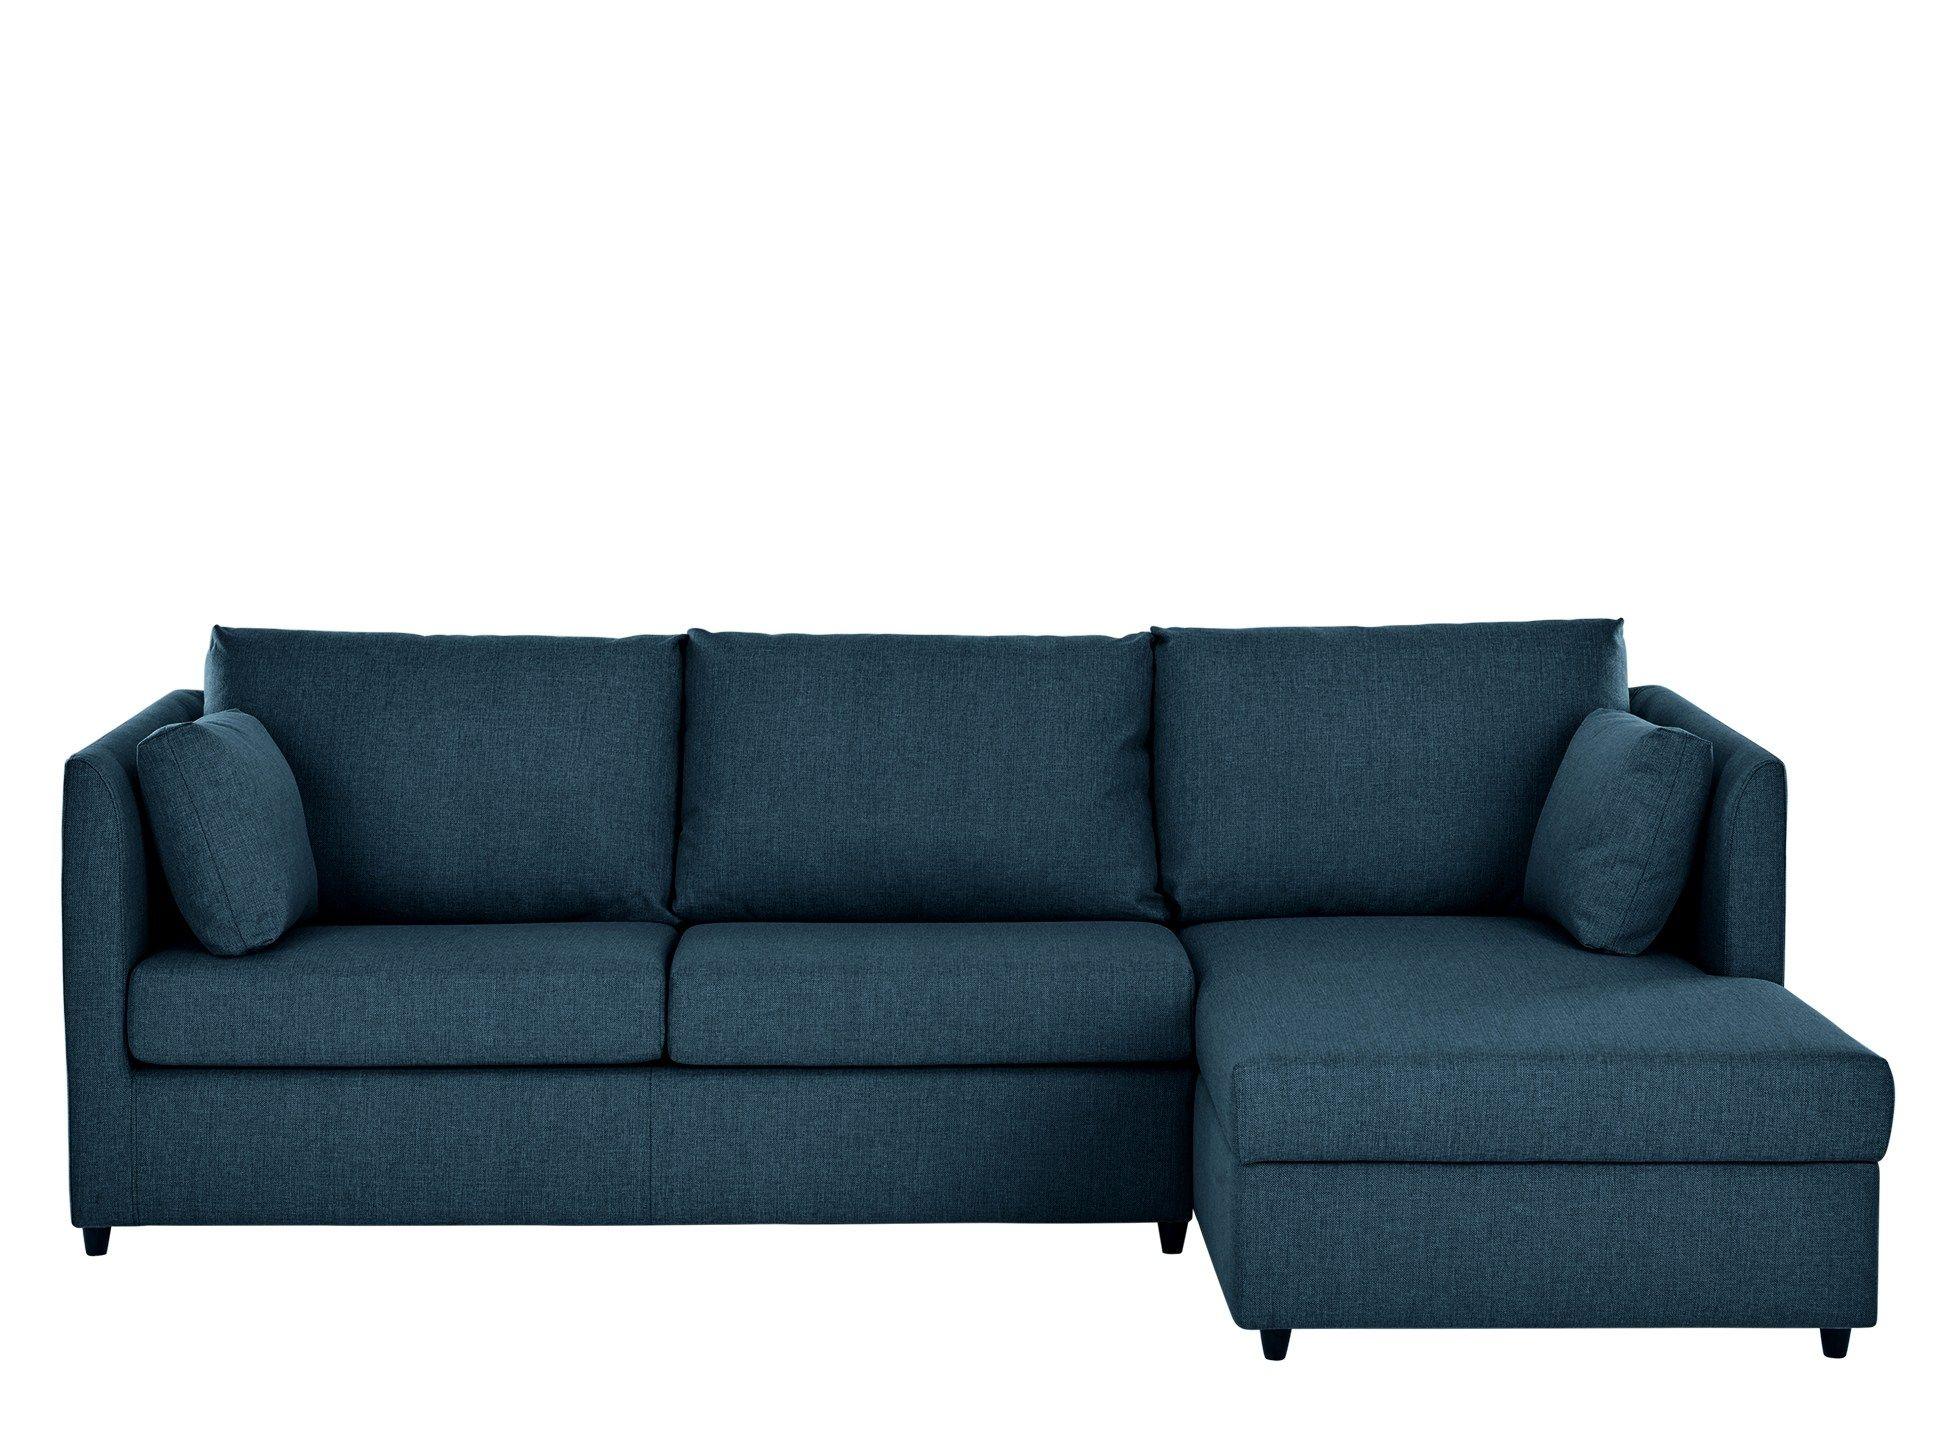 Milner Right Hand Facing Corner Storage Sofa Bed With Memory Foam Mattress Arctic Blue Sofa Bed Blue Corner Sofa Bed With Storage Sofa Bed With Storage